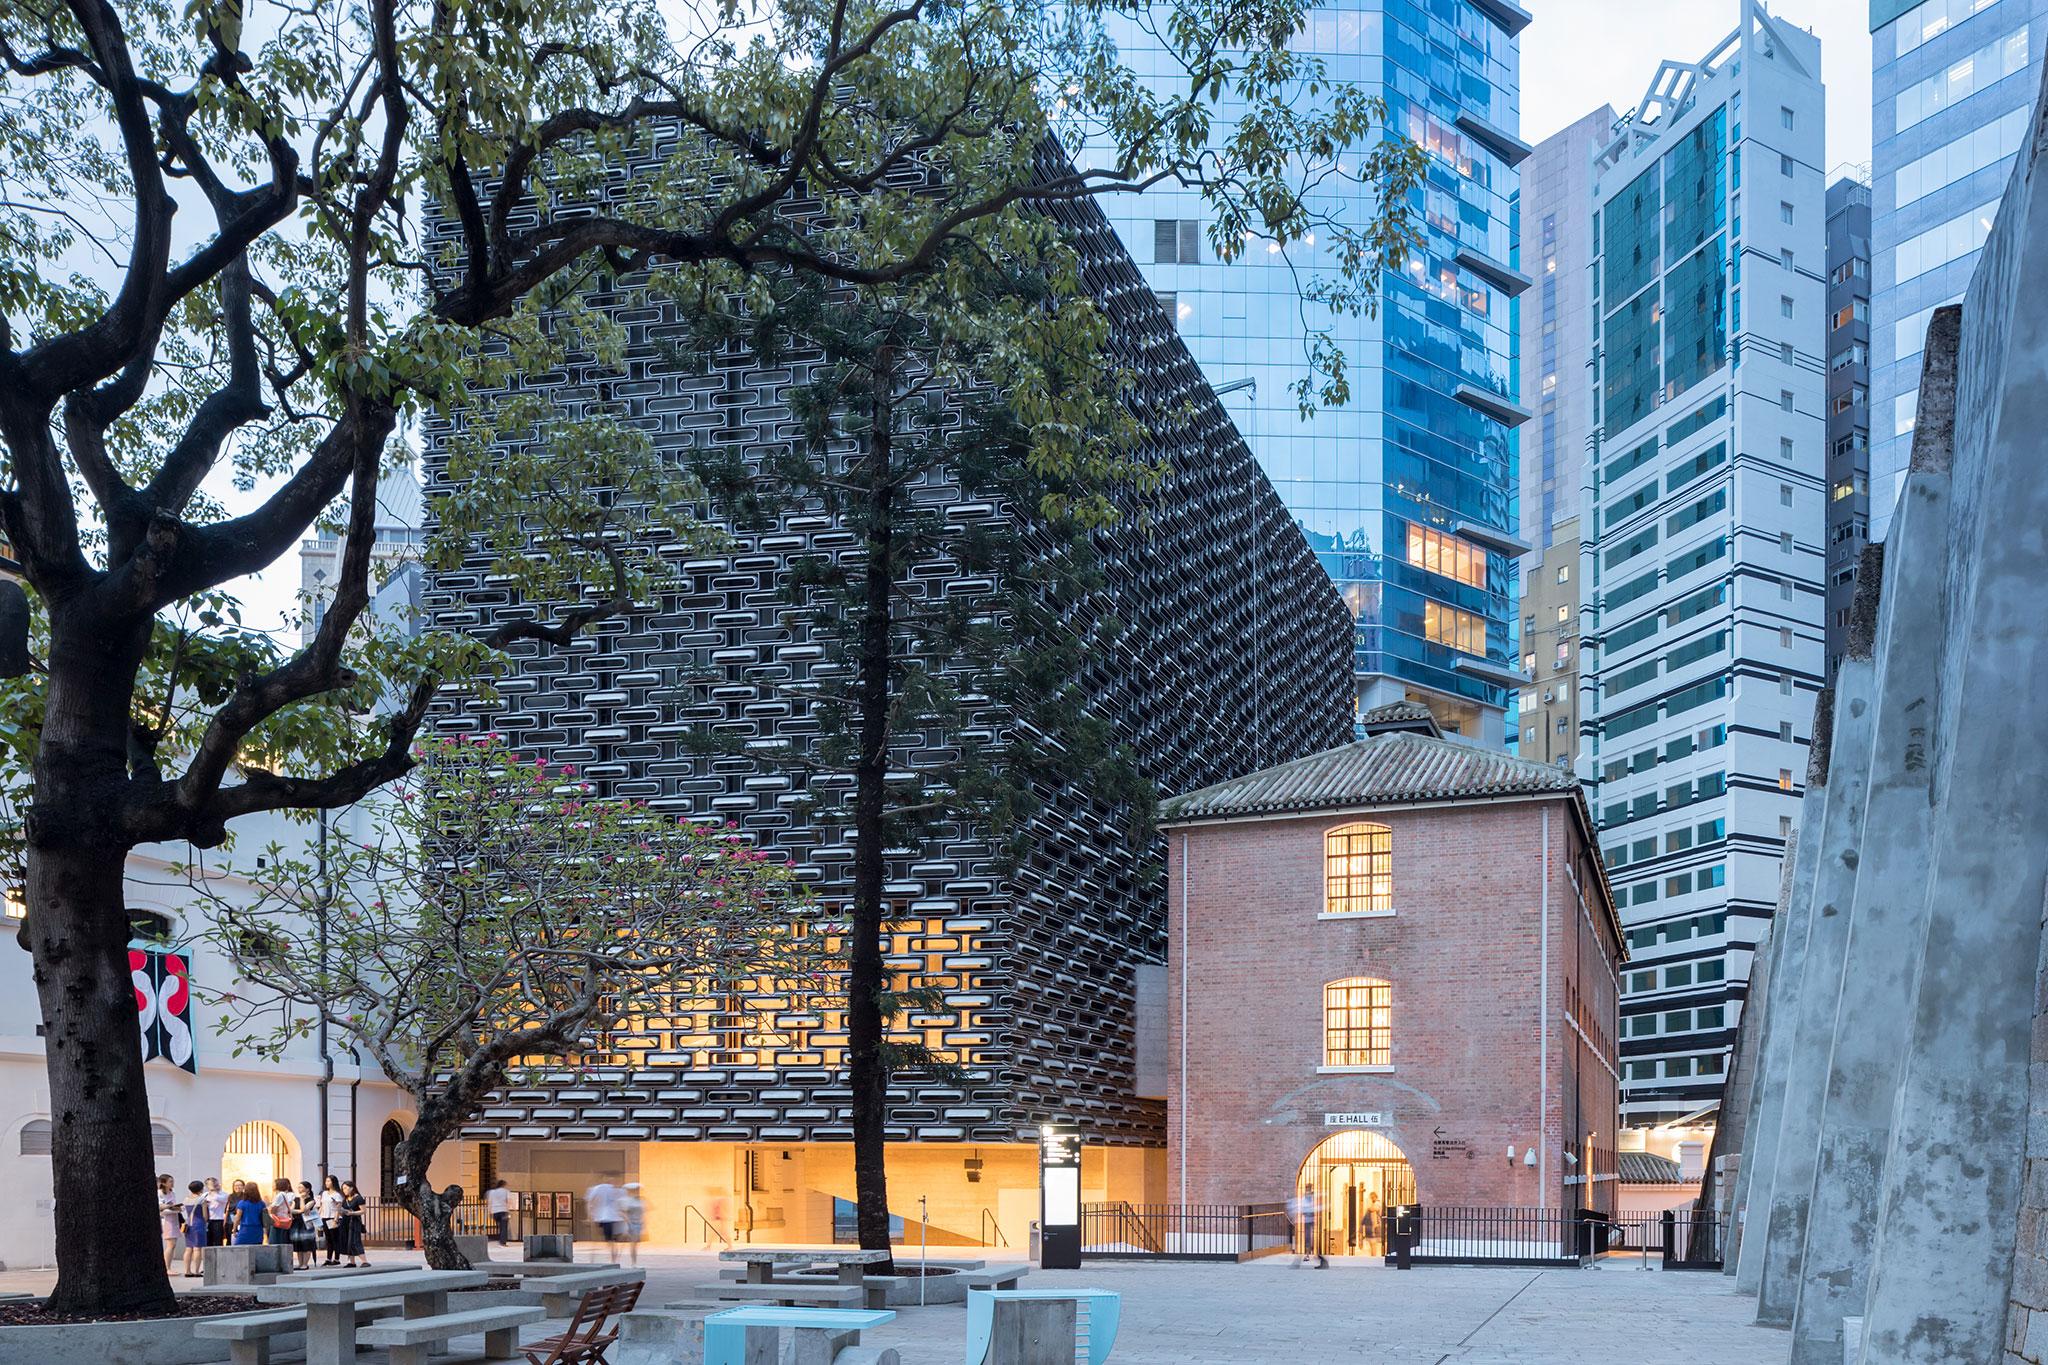 Tai Kwun, new Centre for Heritage & Art by Herzog & de Meuron. Photograph by Iwan Baan